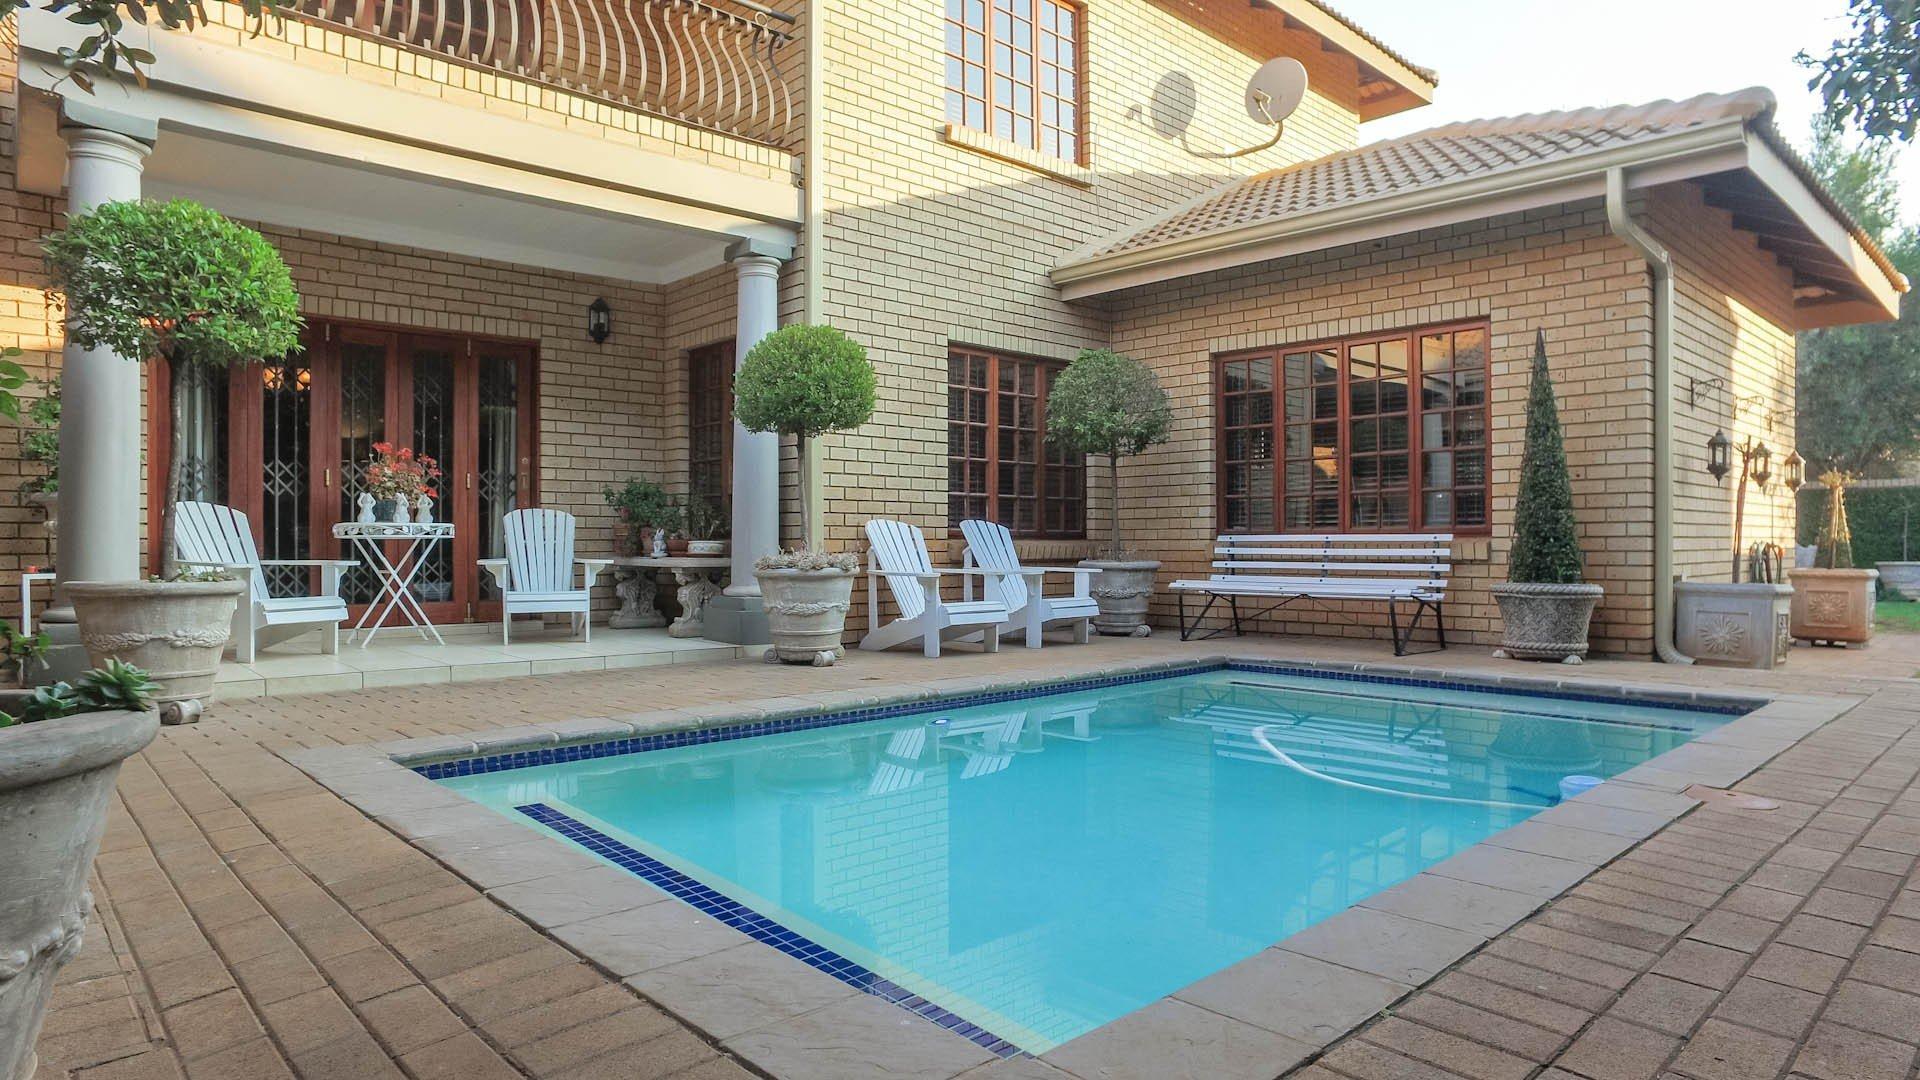 Centurion, Zwartkop Golf Estate Property  | Houses For Sale Zwartkop Golf Estate, Zwartkop Golf Estate, House 3 bedrooms property for sale Price:3,450,000